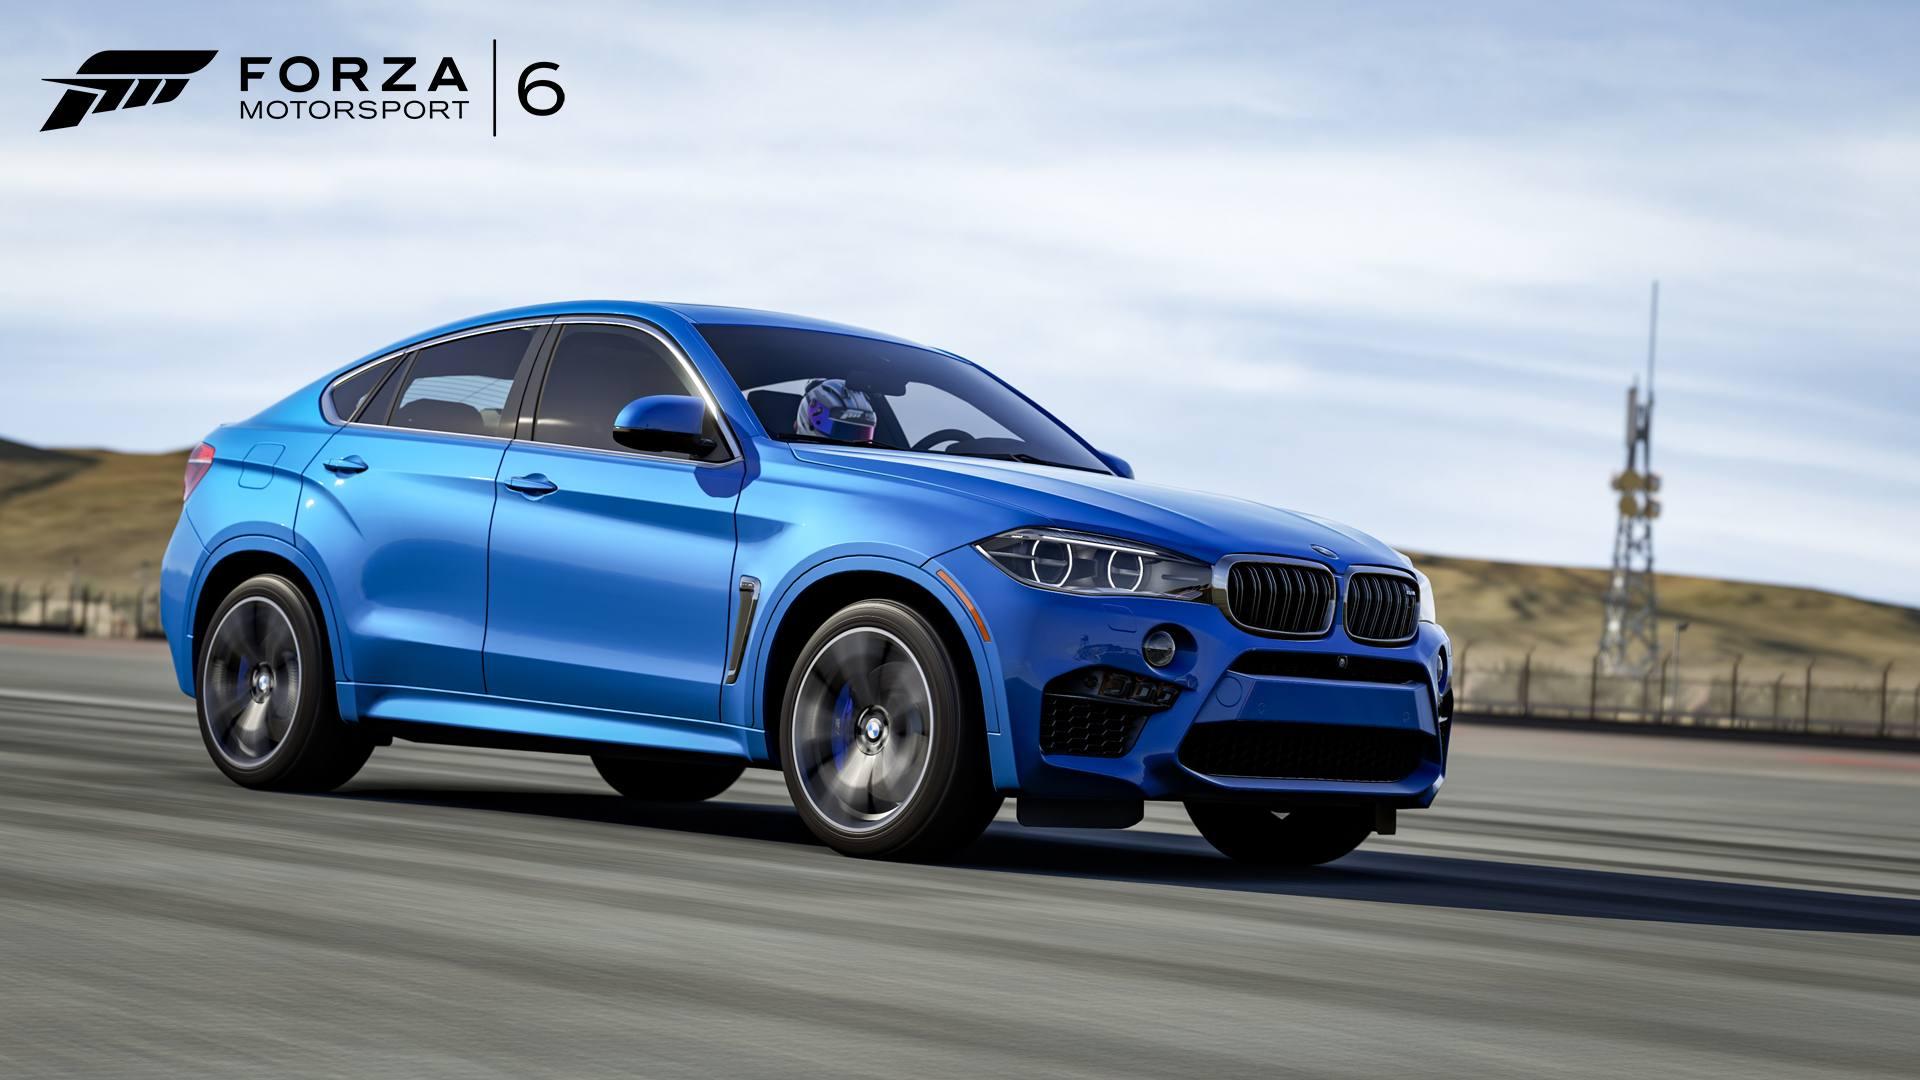 Forza Motorsport 6 DLC Hot Wheels 03-05-16 2015 BMW X6M